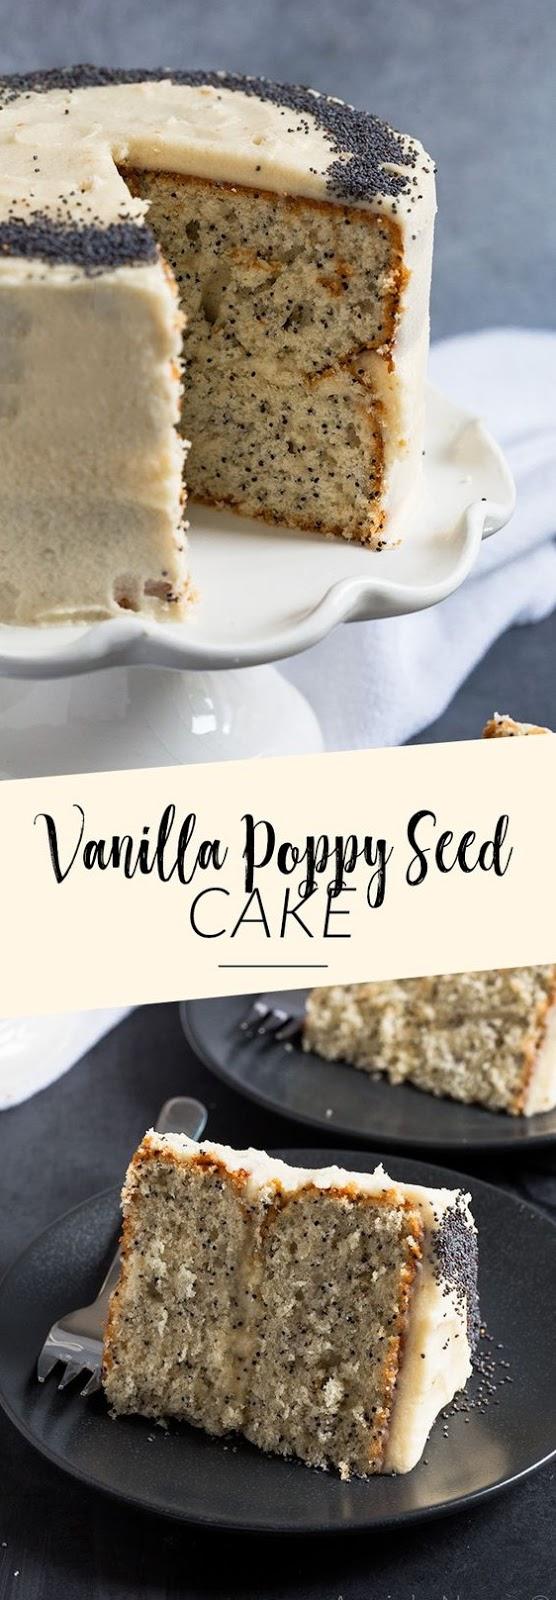 Vanilla Poppy Seed Cake